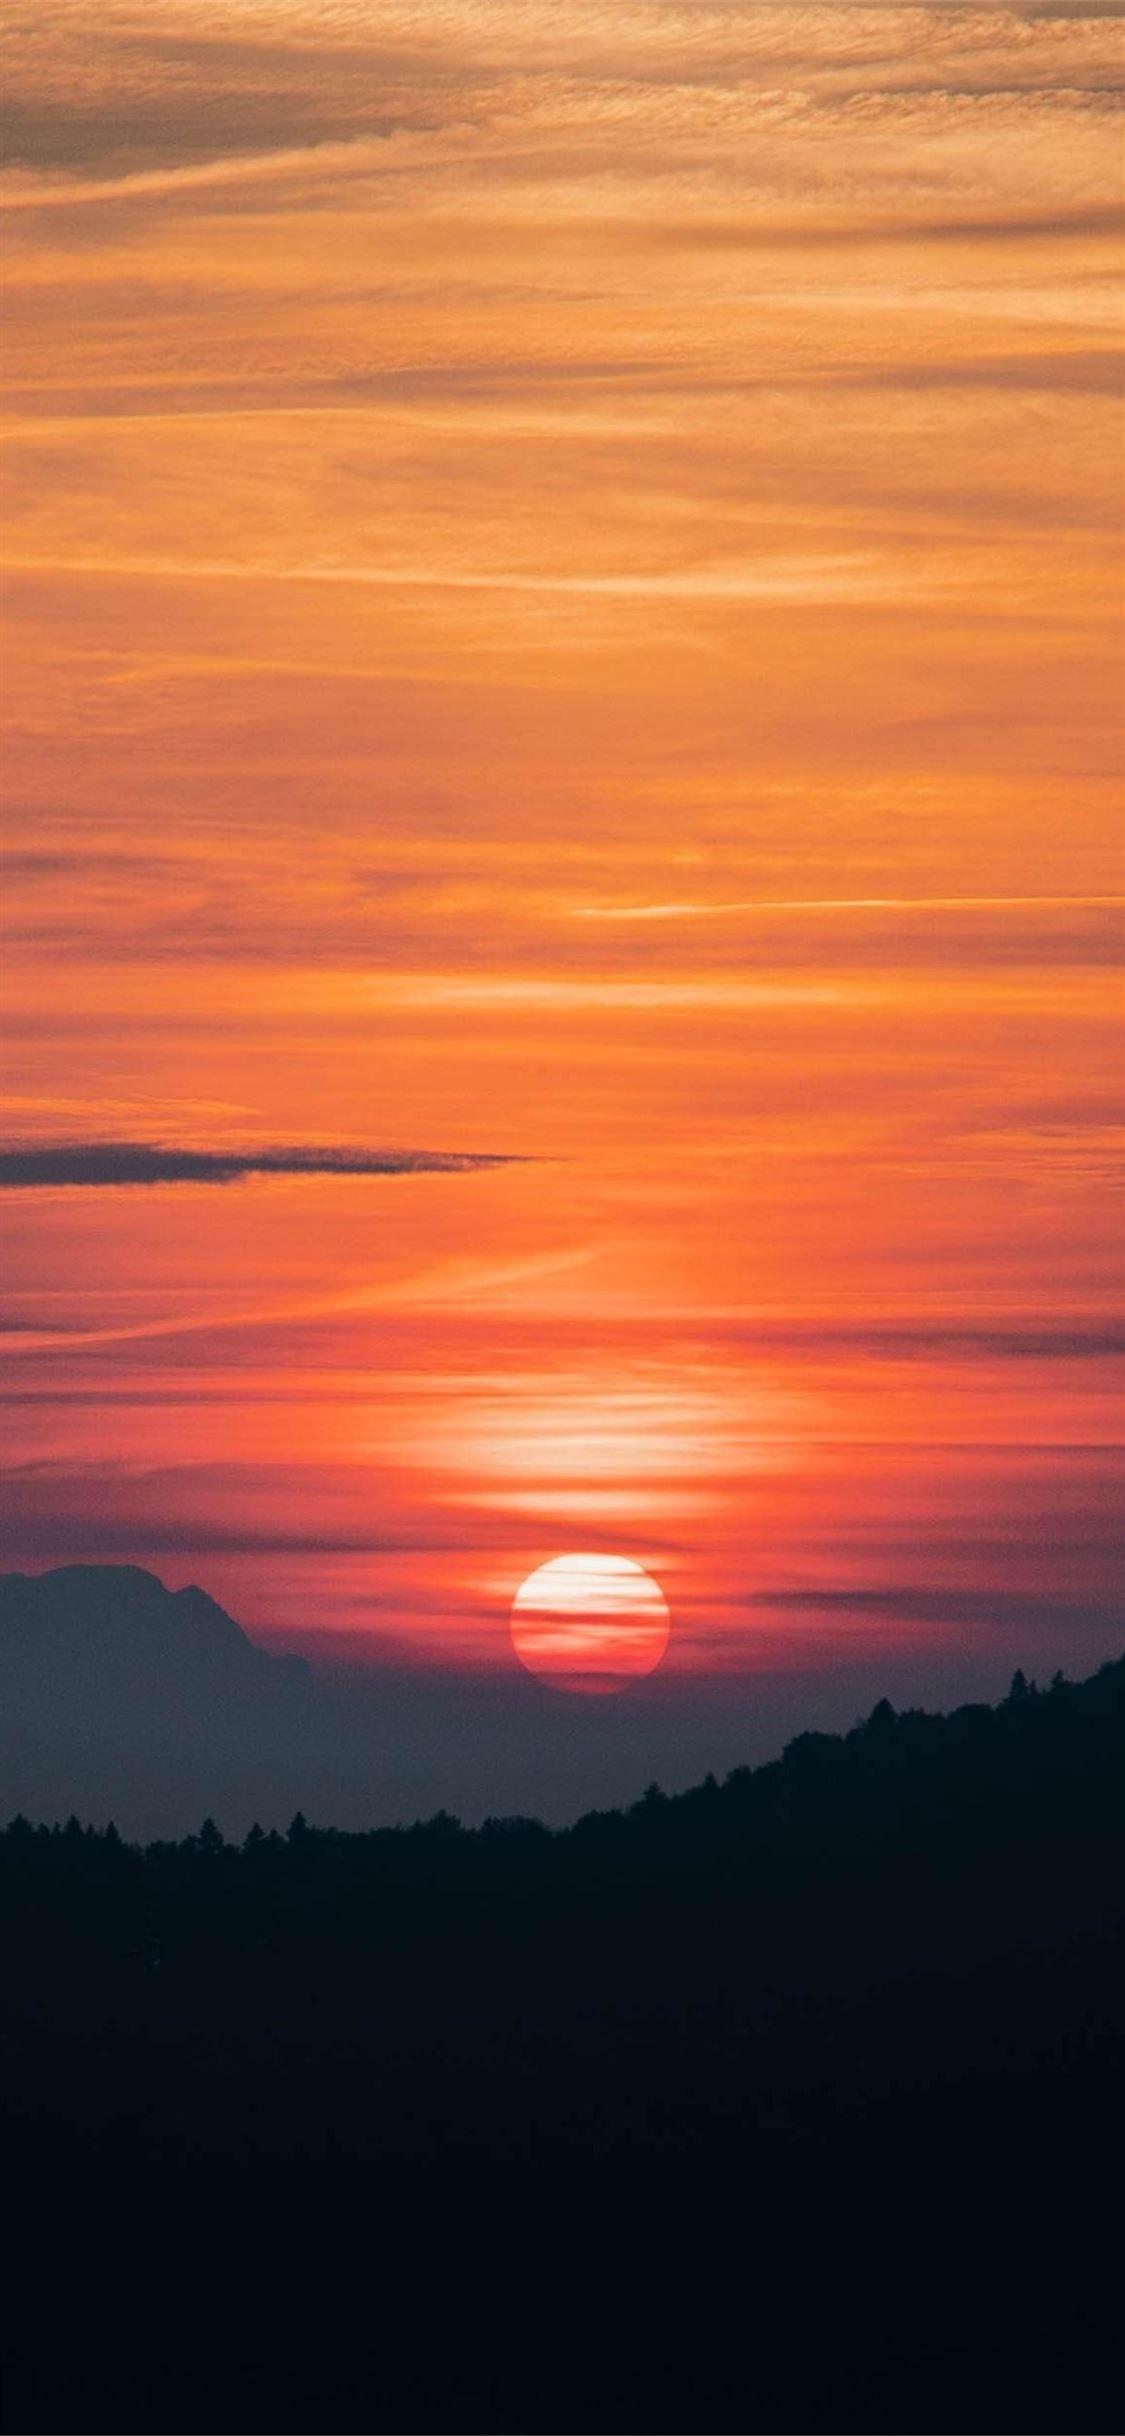 Sunset 4k Sunset Nature 4k Iphone11wallpaper In 2020 Iphone Wallpaper Sky Sunset Wallpaper Sky Aesthetic